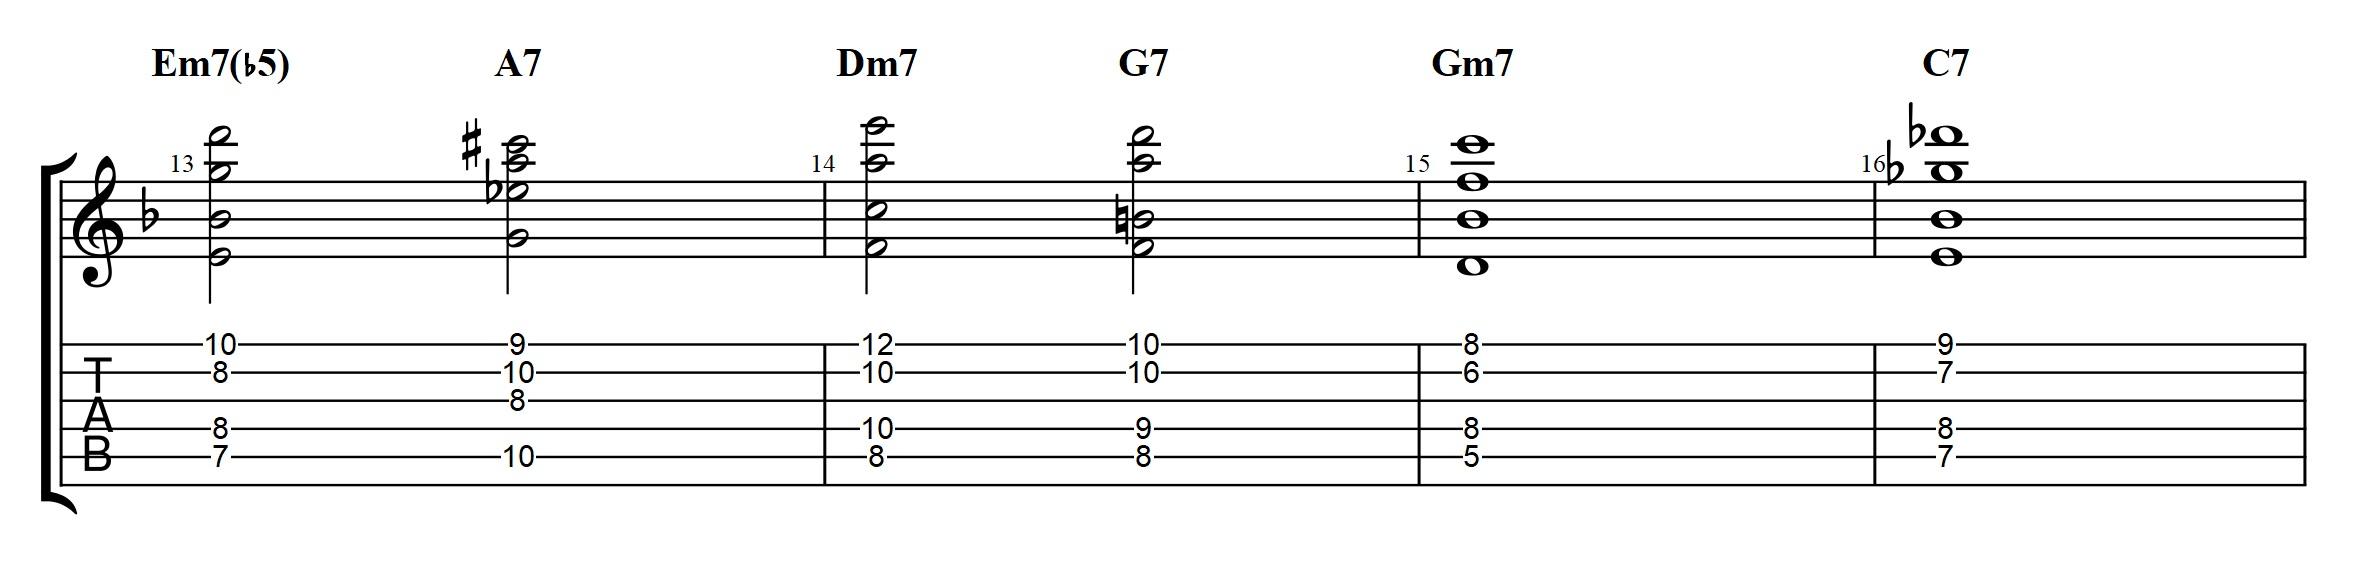 Allan Holdsworth Chords On A Jazz Standard Advanced Modern Chord